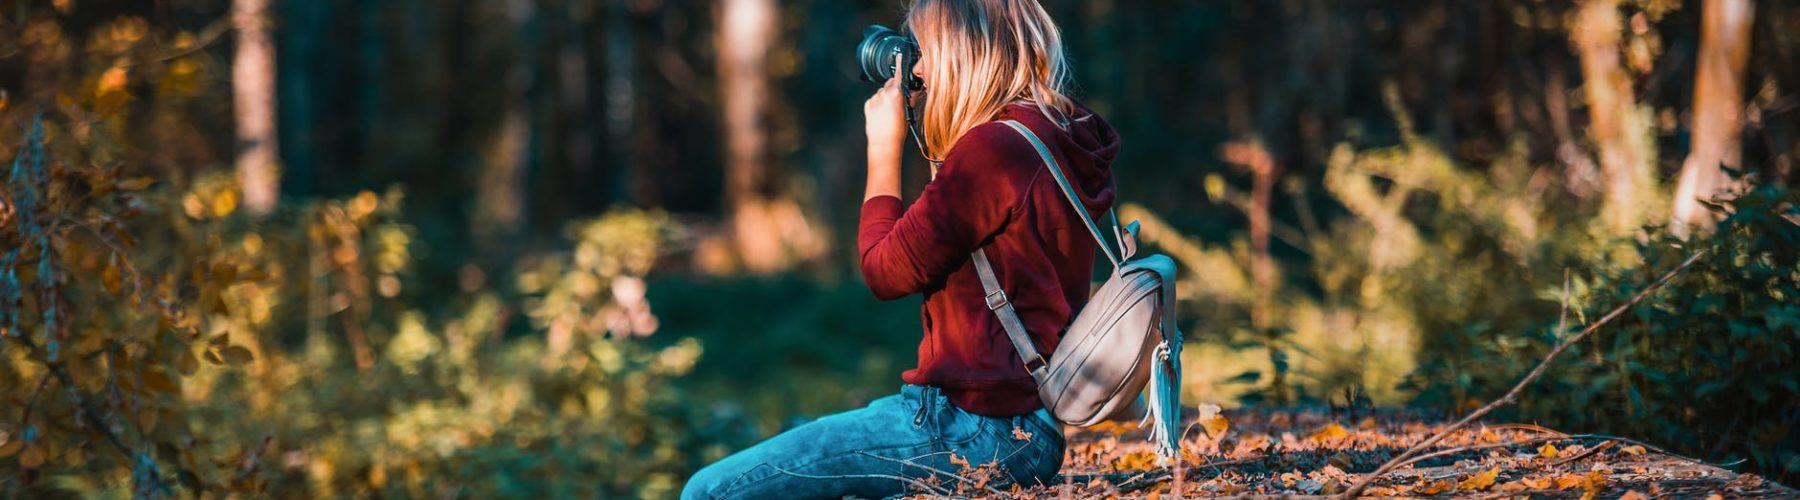 5 Fun Hobbies That Can Make You Profit